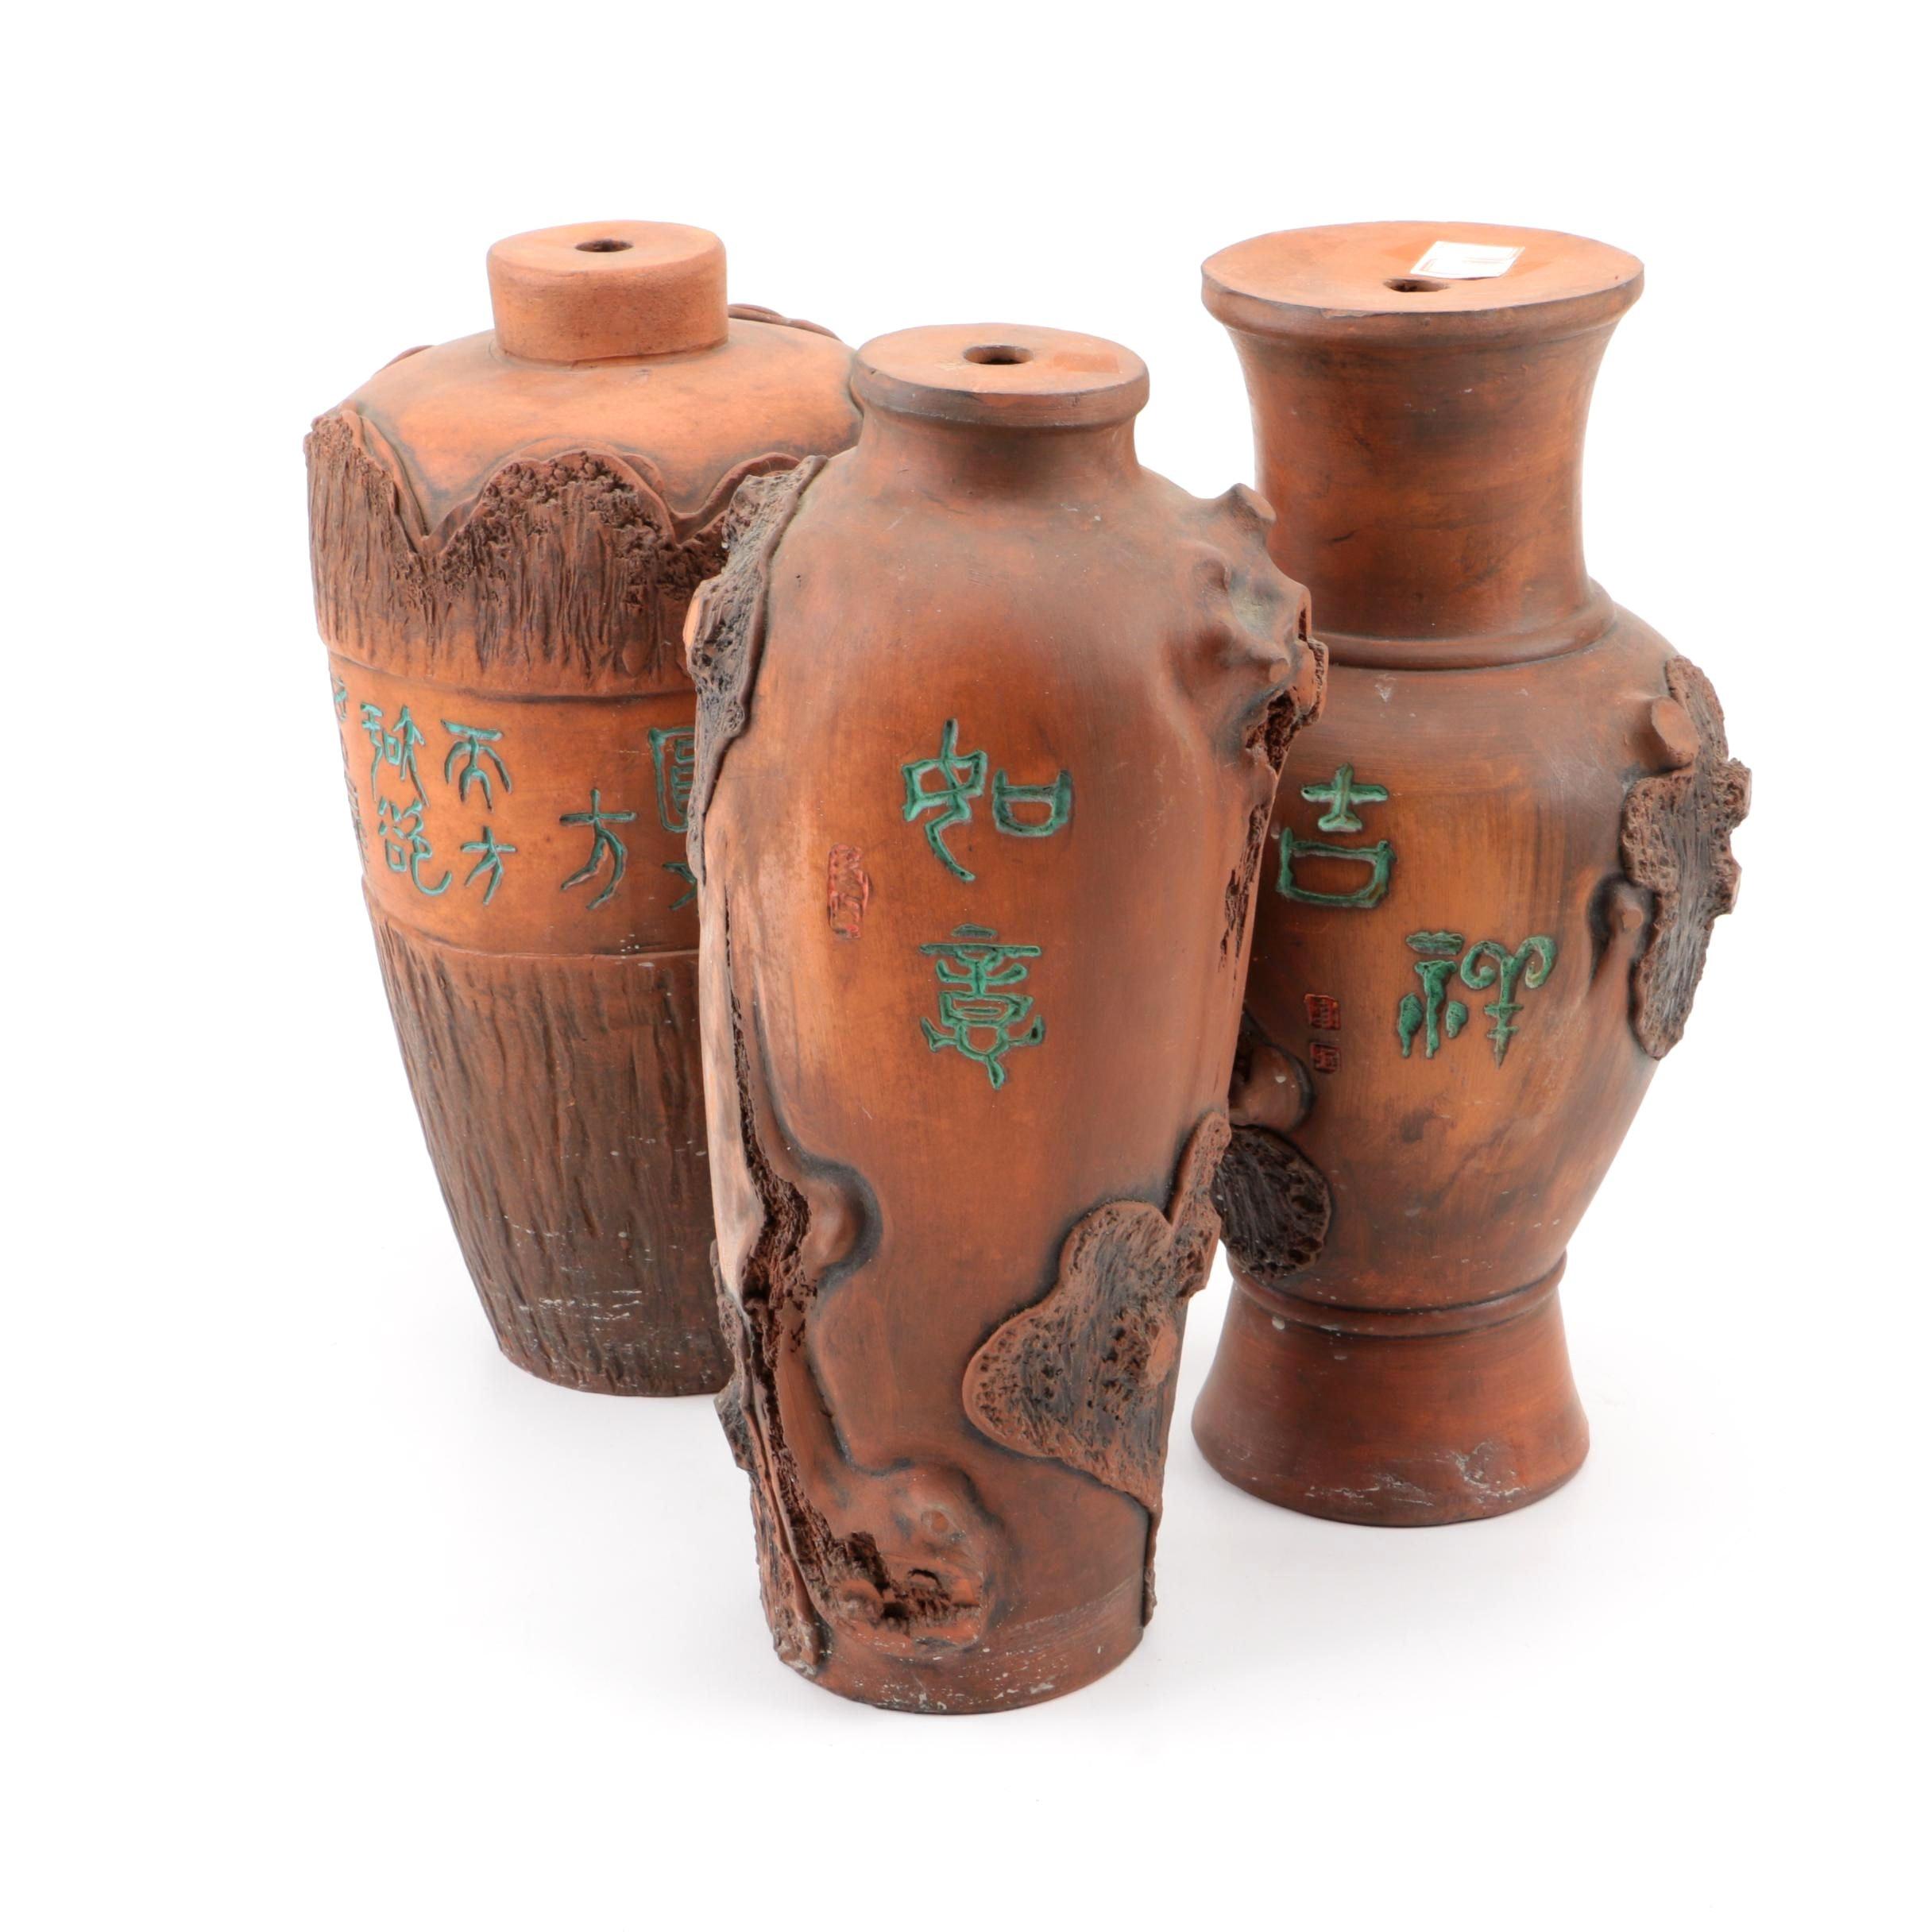 Chinese Ceramic Lamp Bases